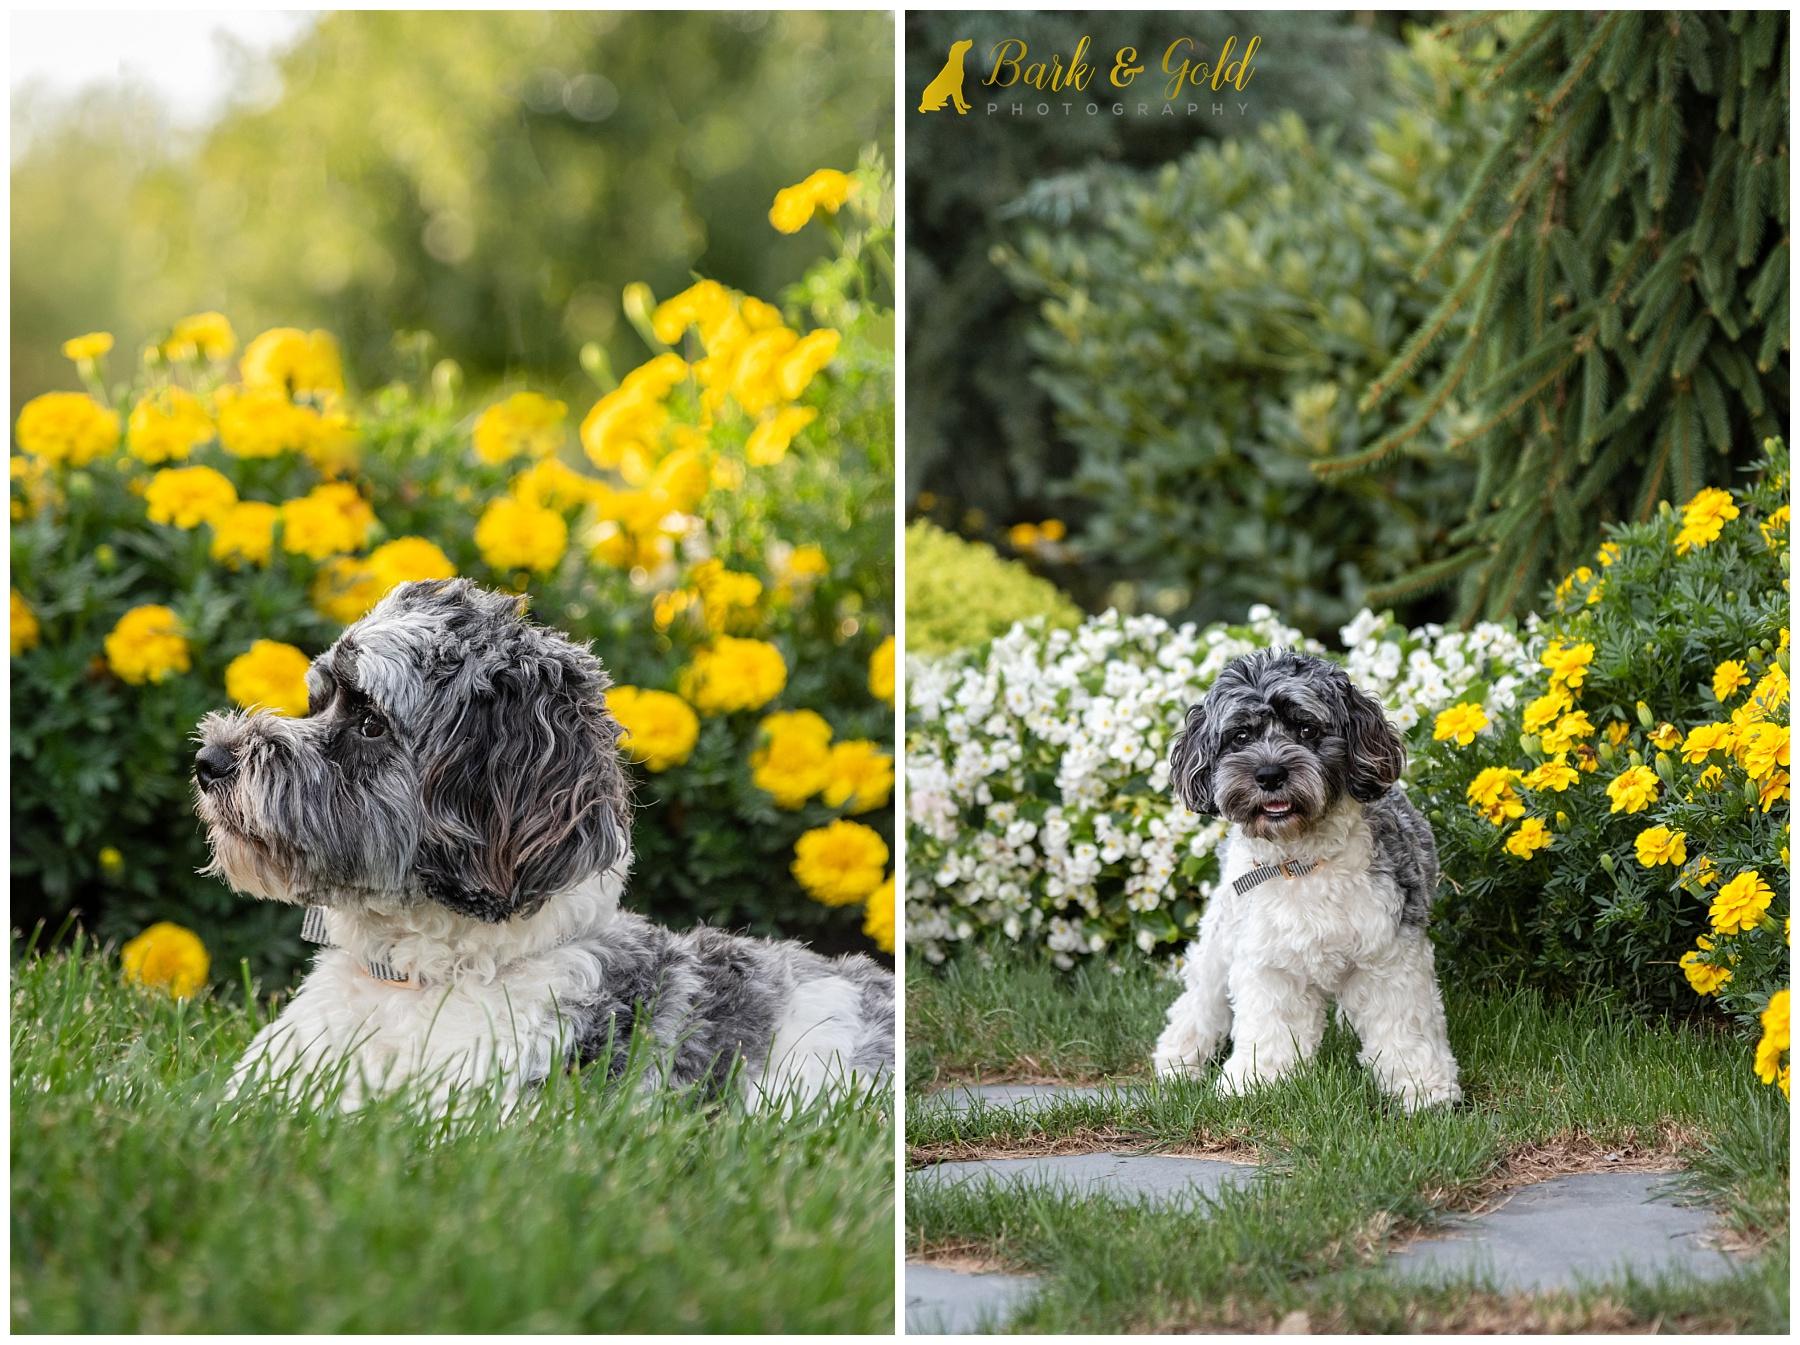 Cavapoo puppy in backyard garden flowers